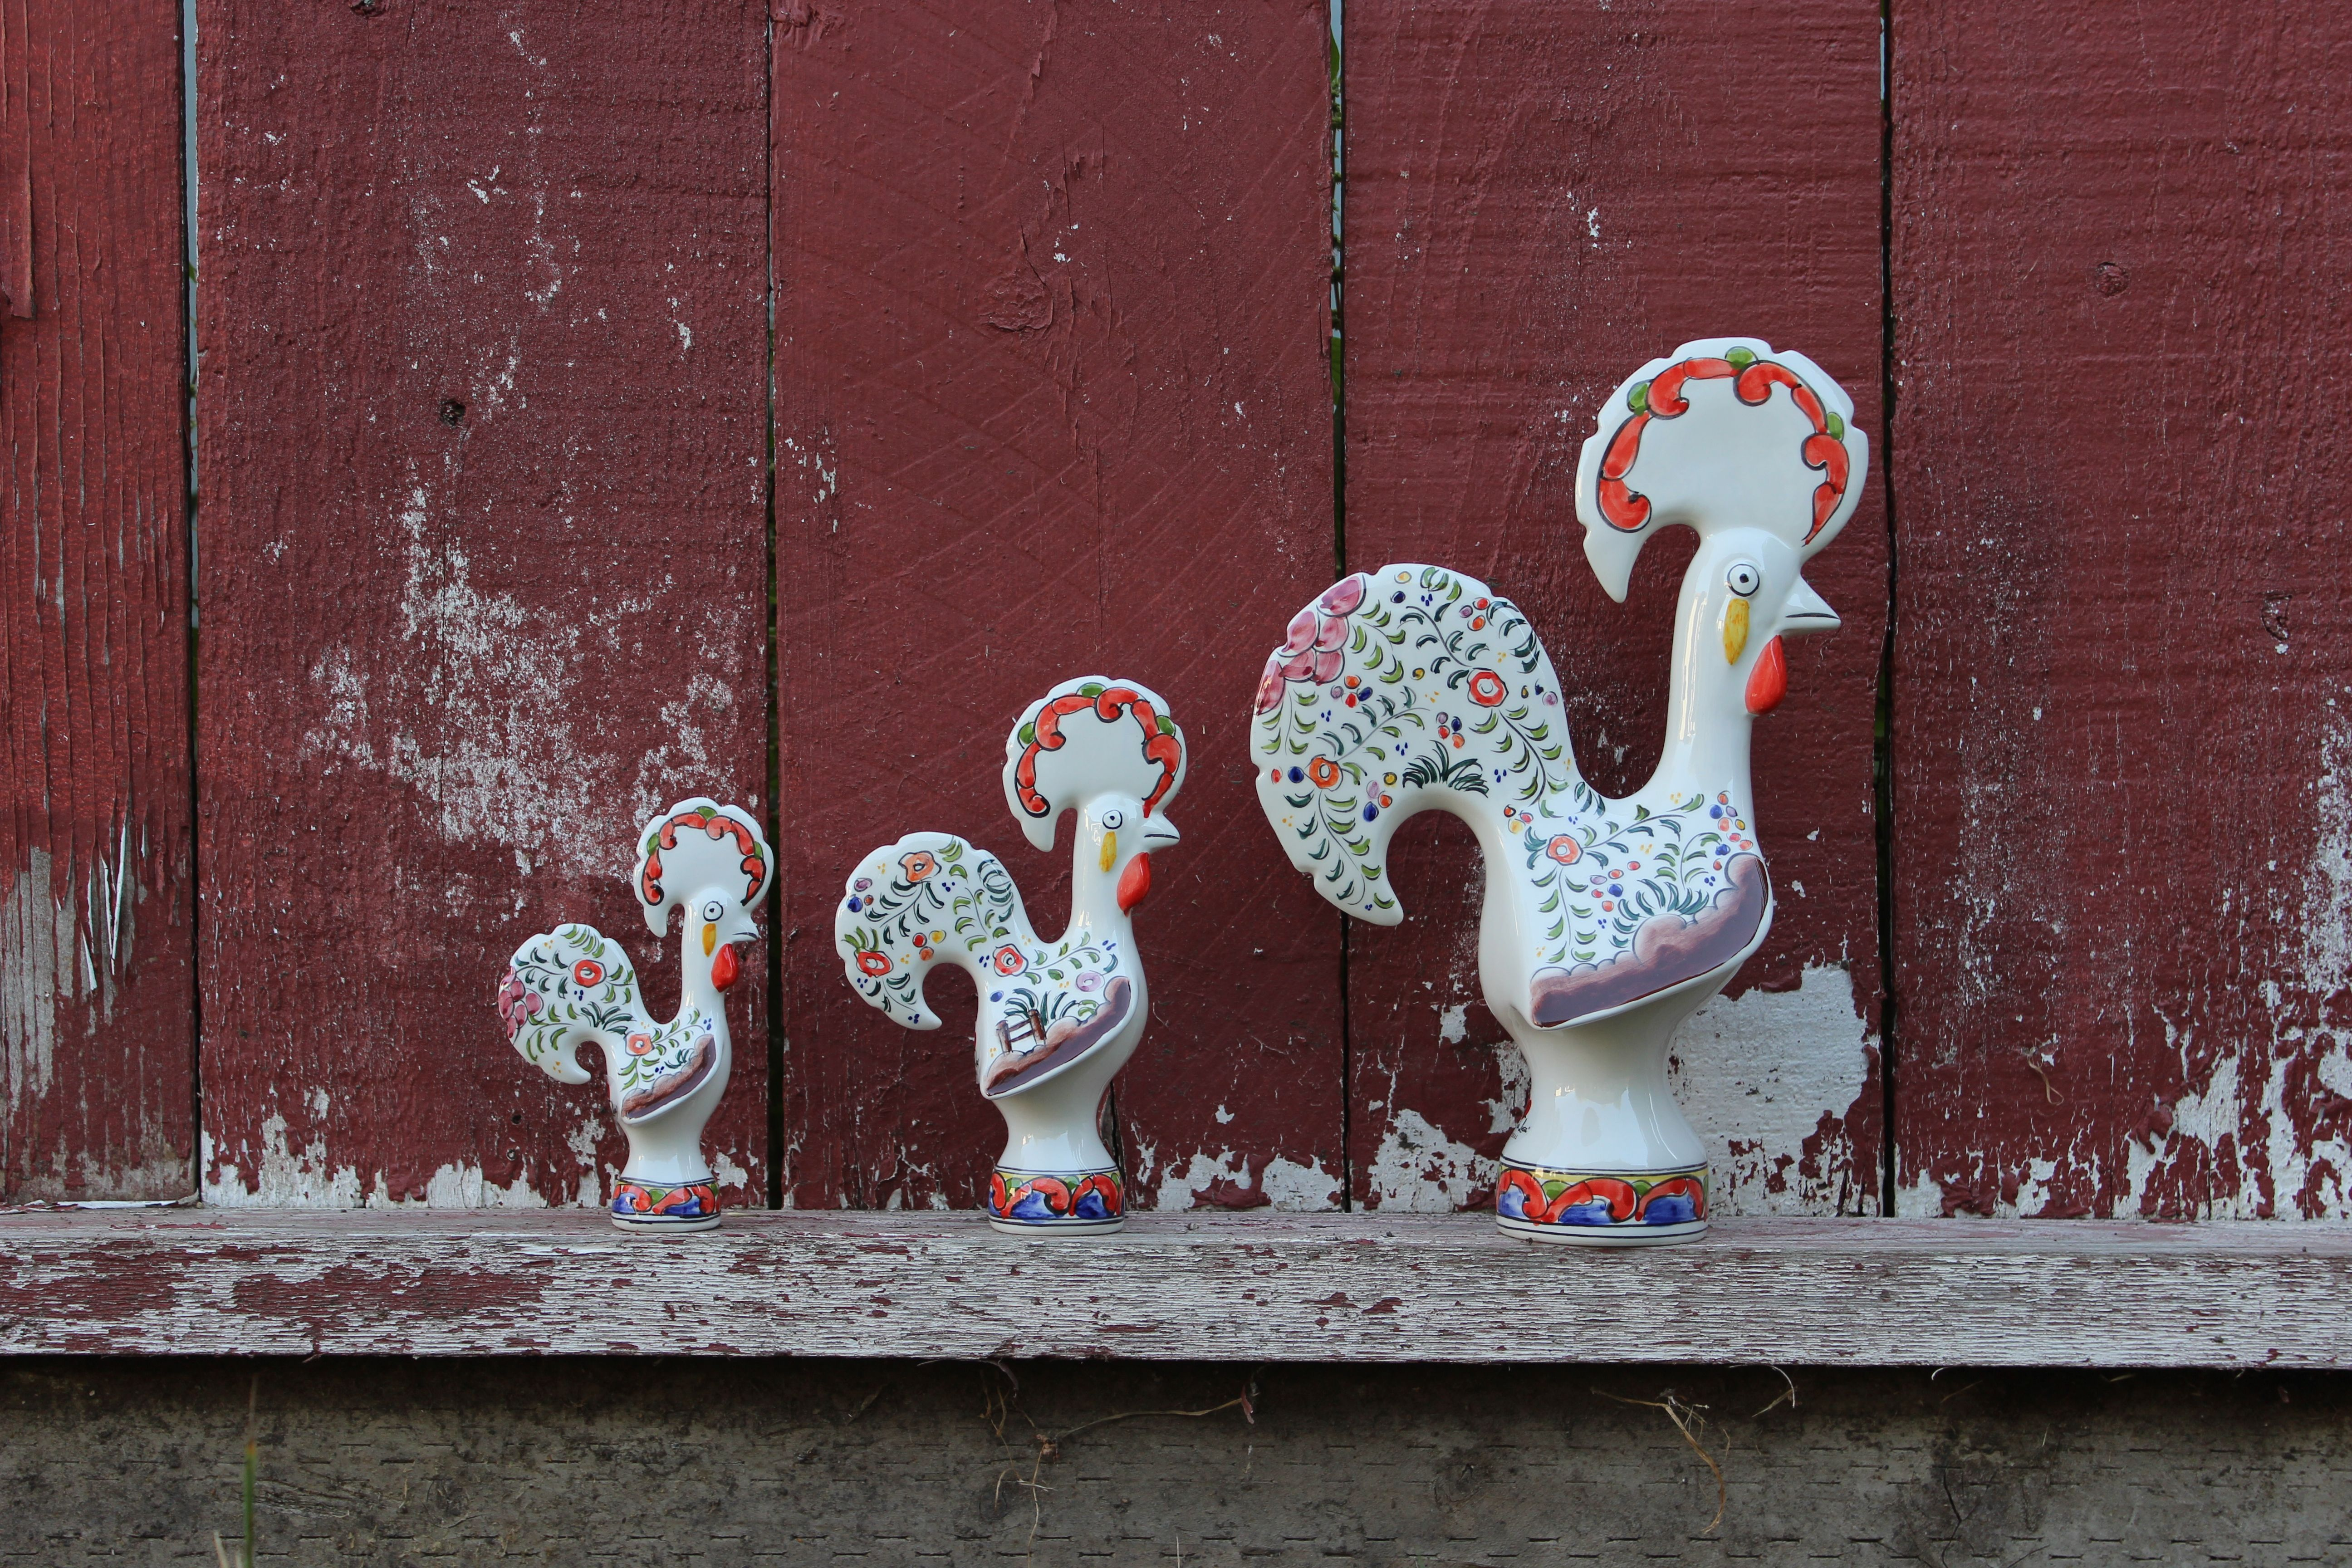 Galo de Barcelos.  www.coisanossa.com #galodebarcelos #portuguese #portugal #rooster